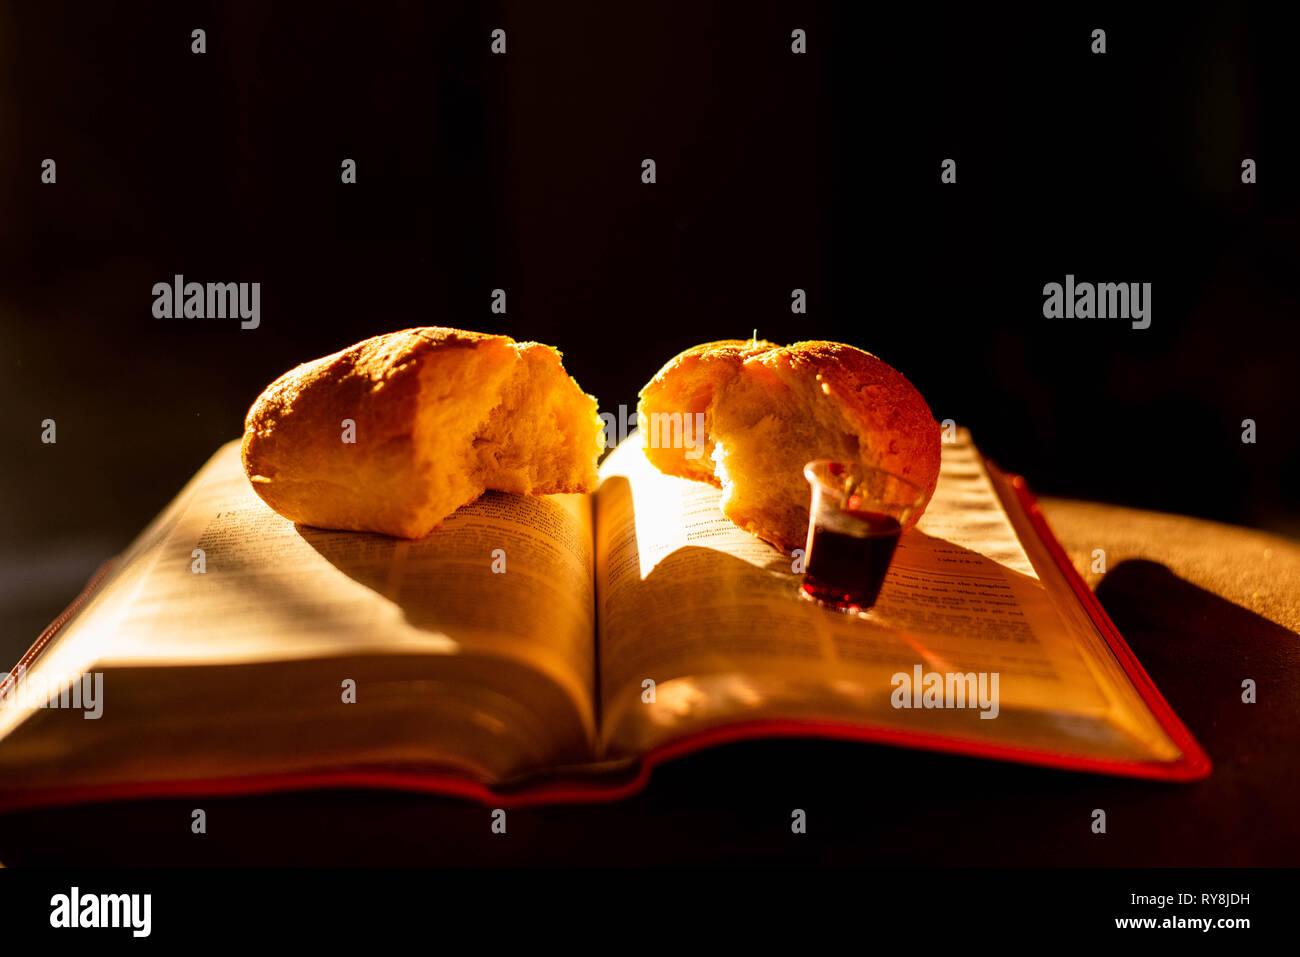 Communion cups and bread represent the last supper of Jesus